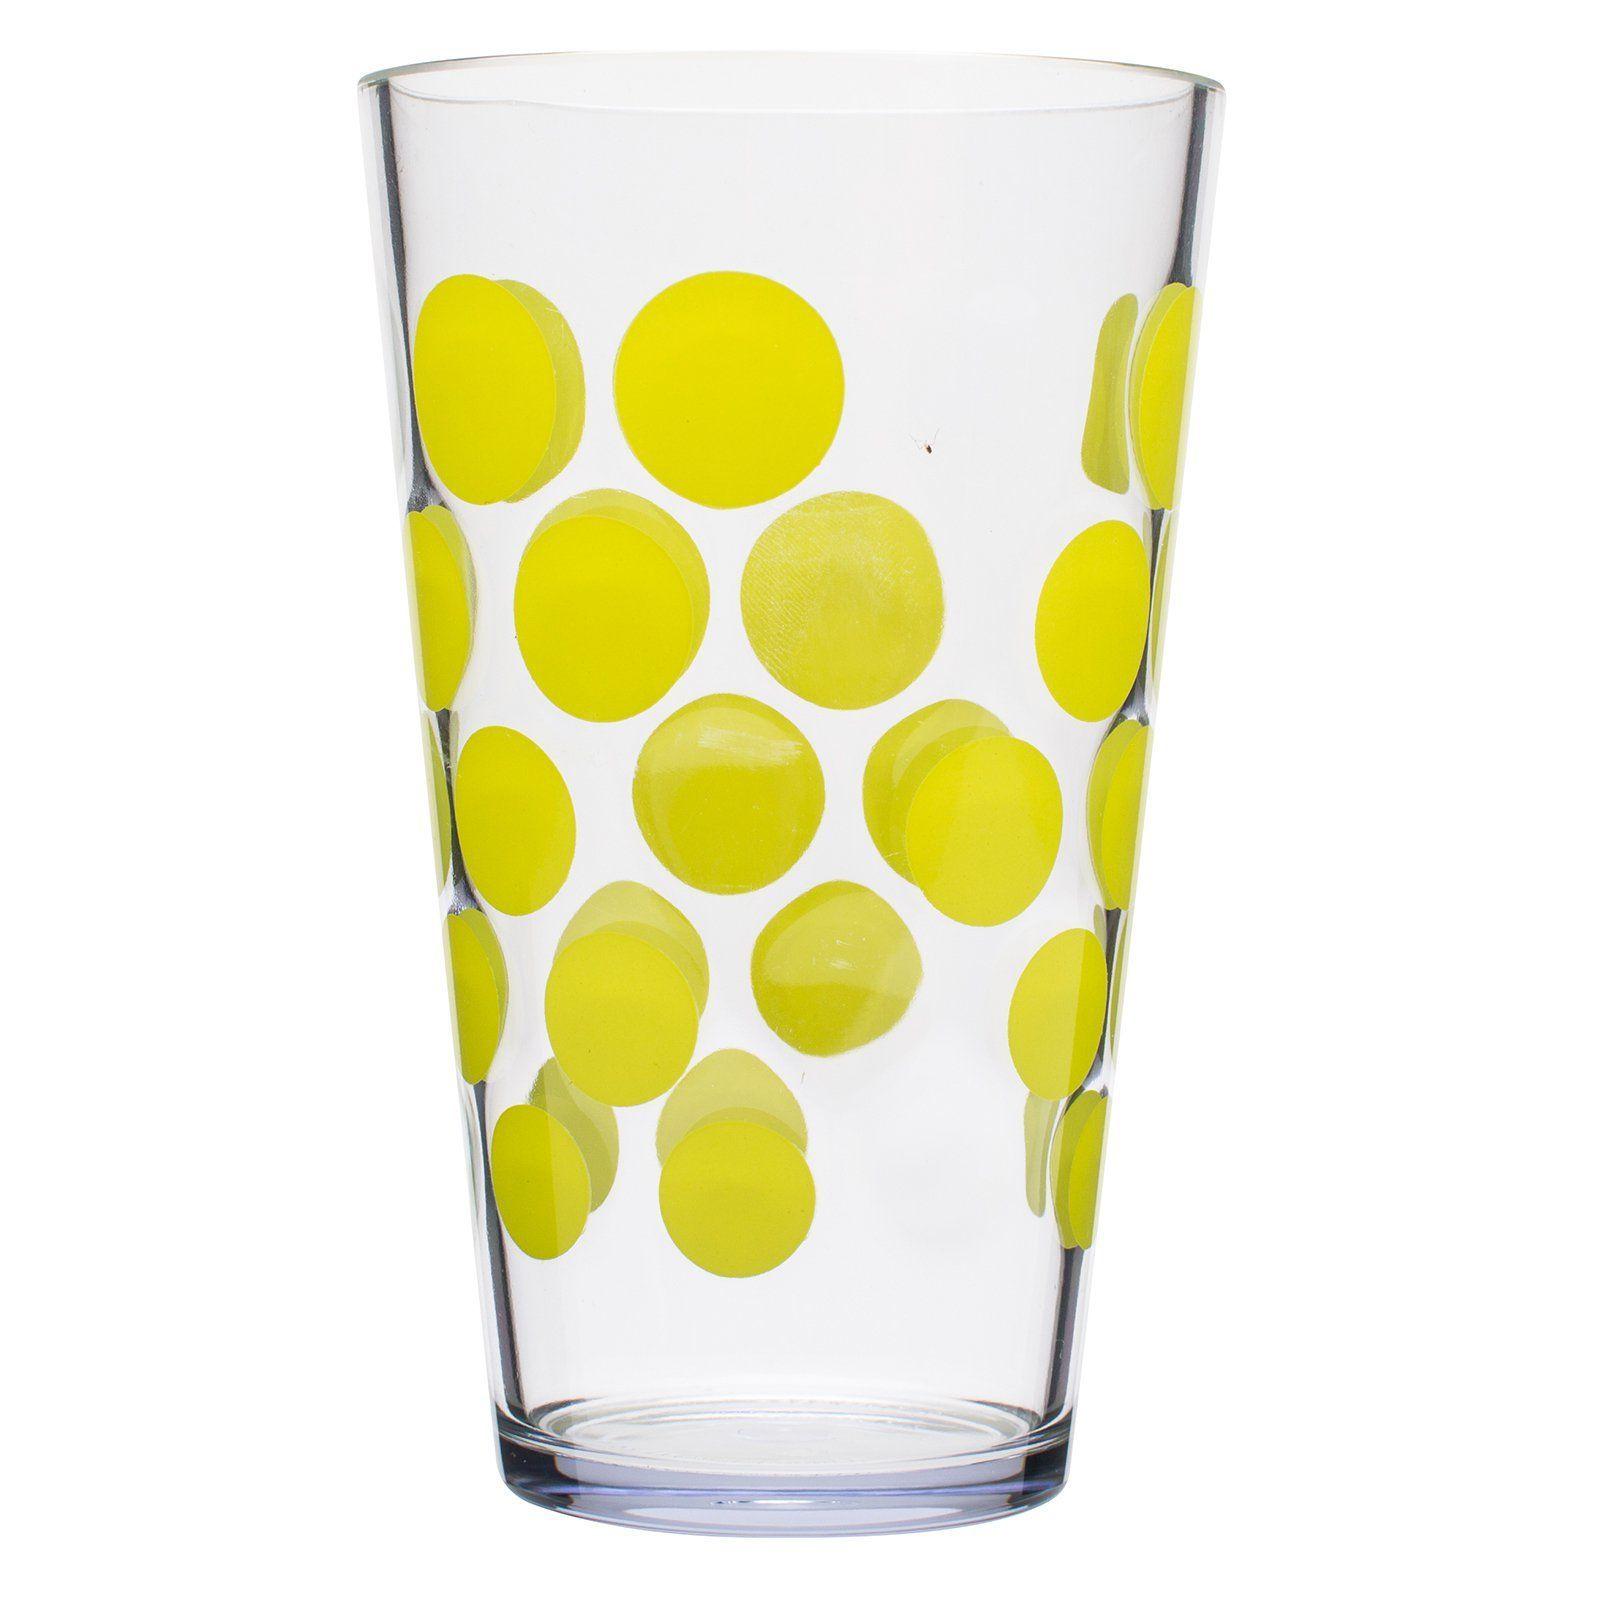 Zak Designs Dot Dot 19 Oz Hiball Glass Set Of 6 0989